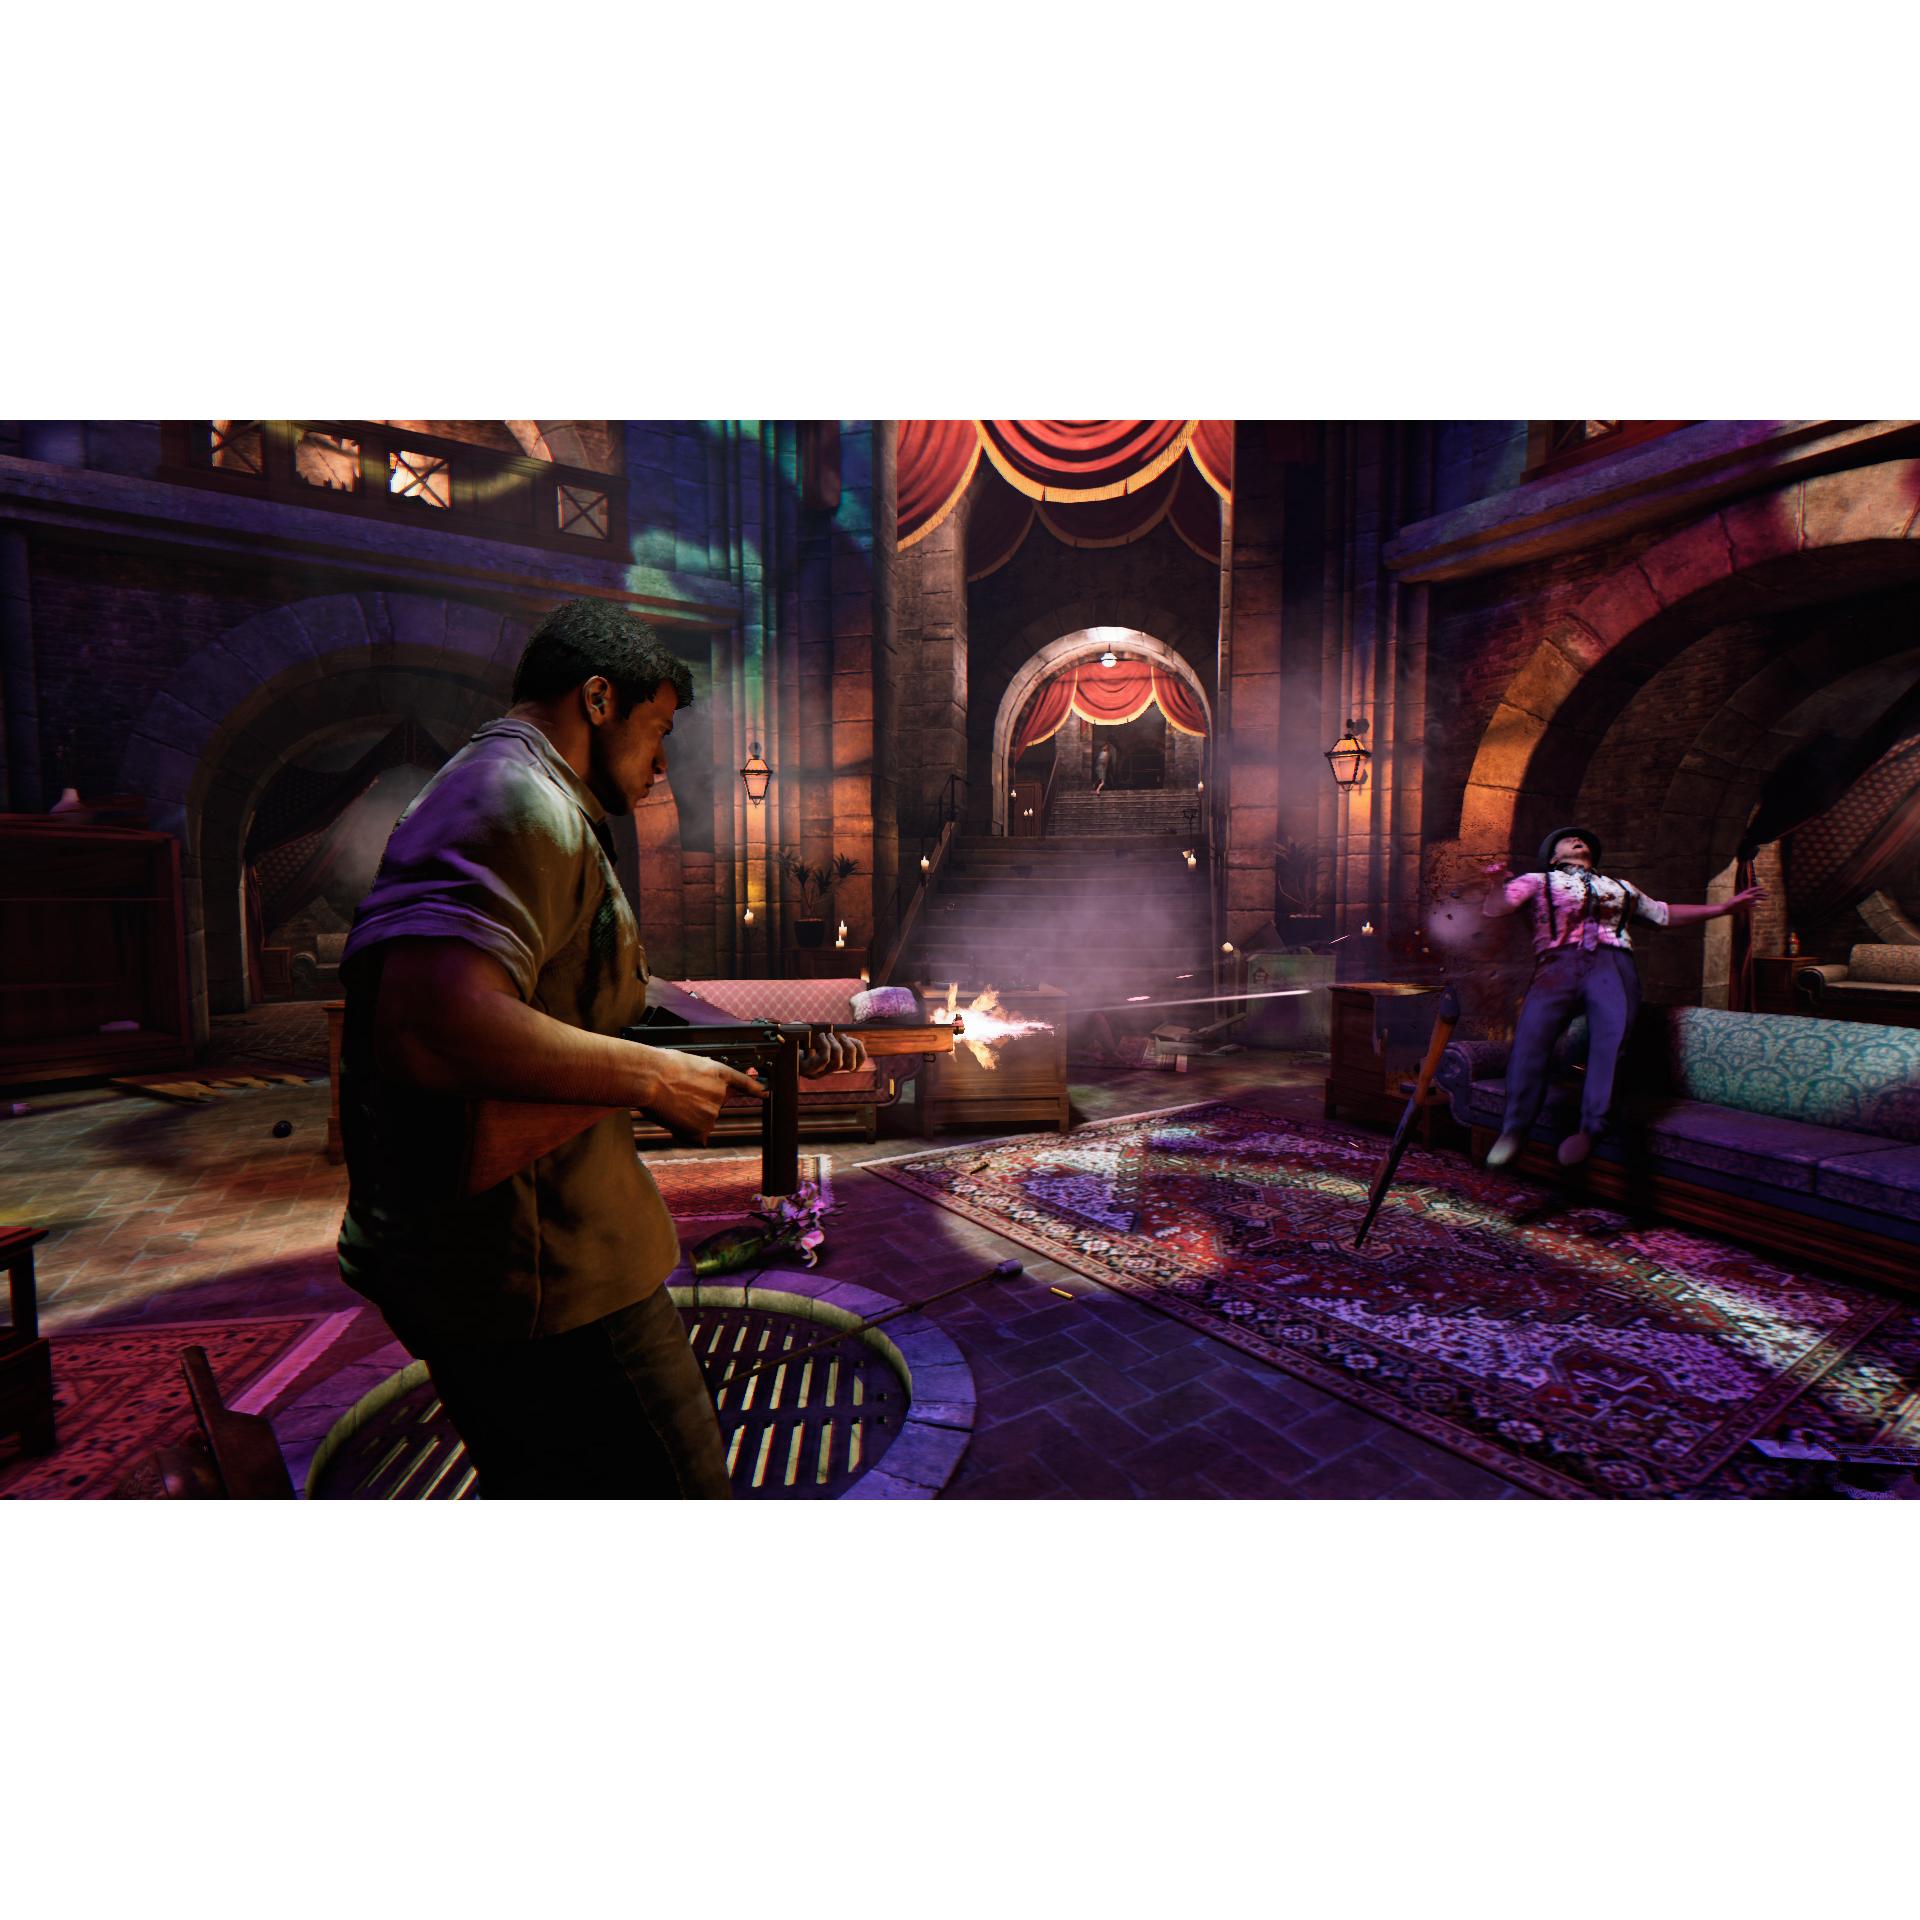 Joc Mafia 3 pentru Playstation 4 2